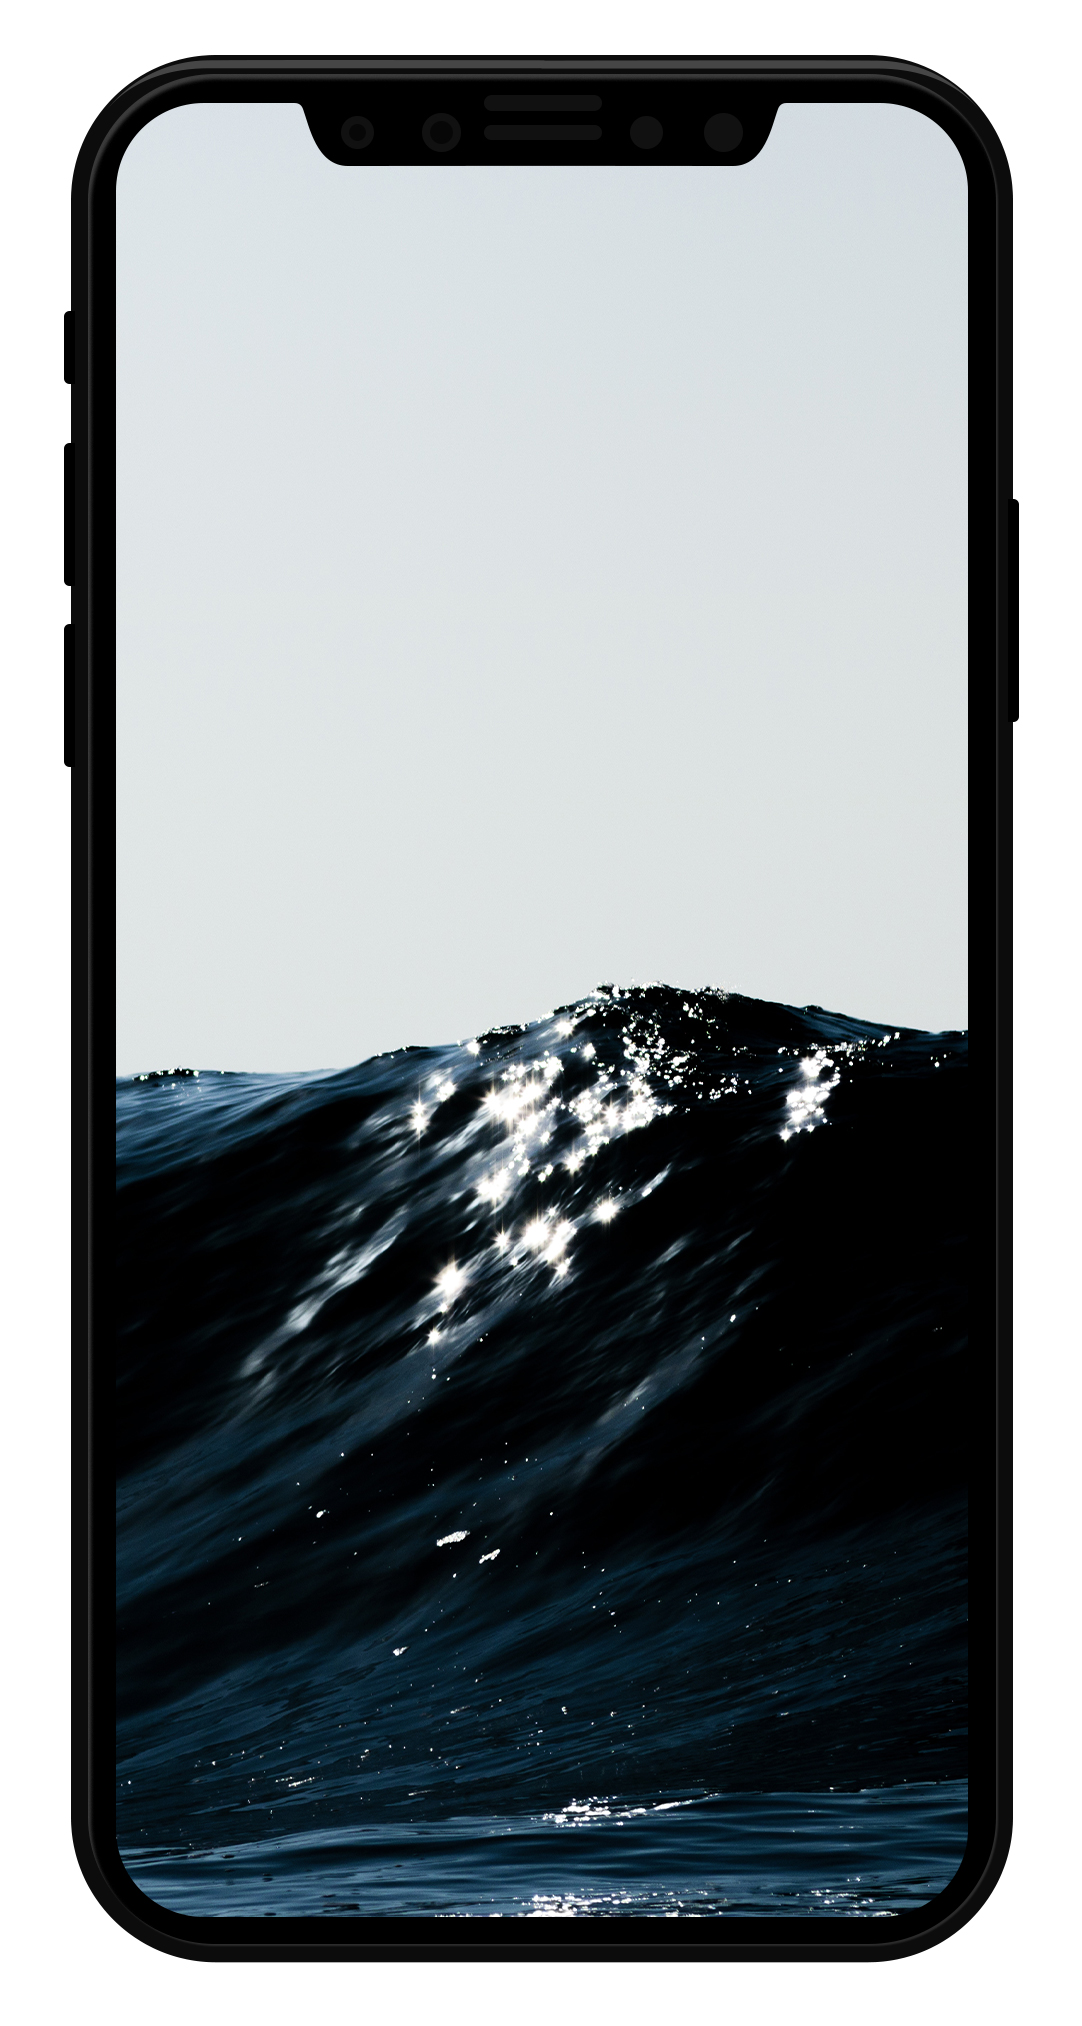 iphone-8-mockcdrup-downloadable.jpg